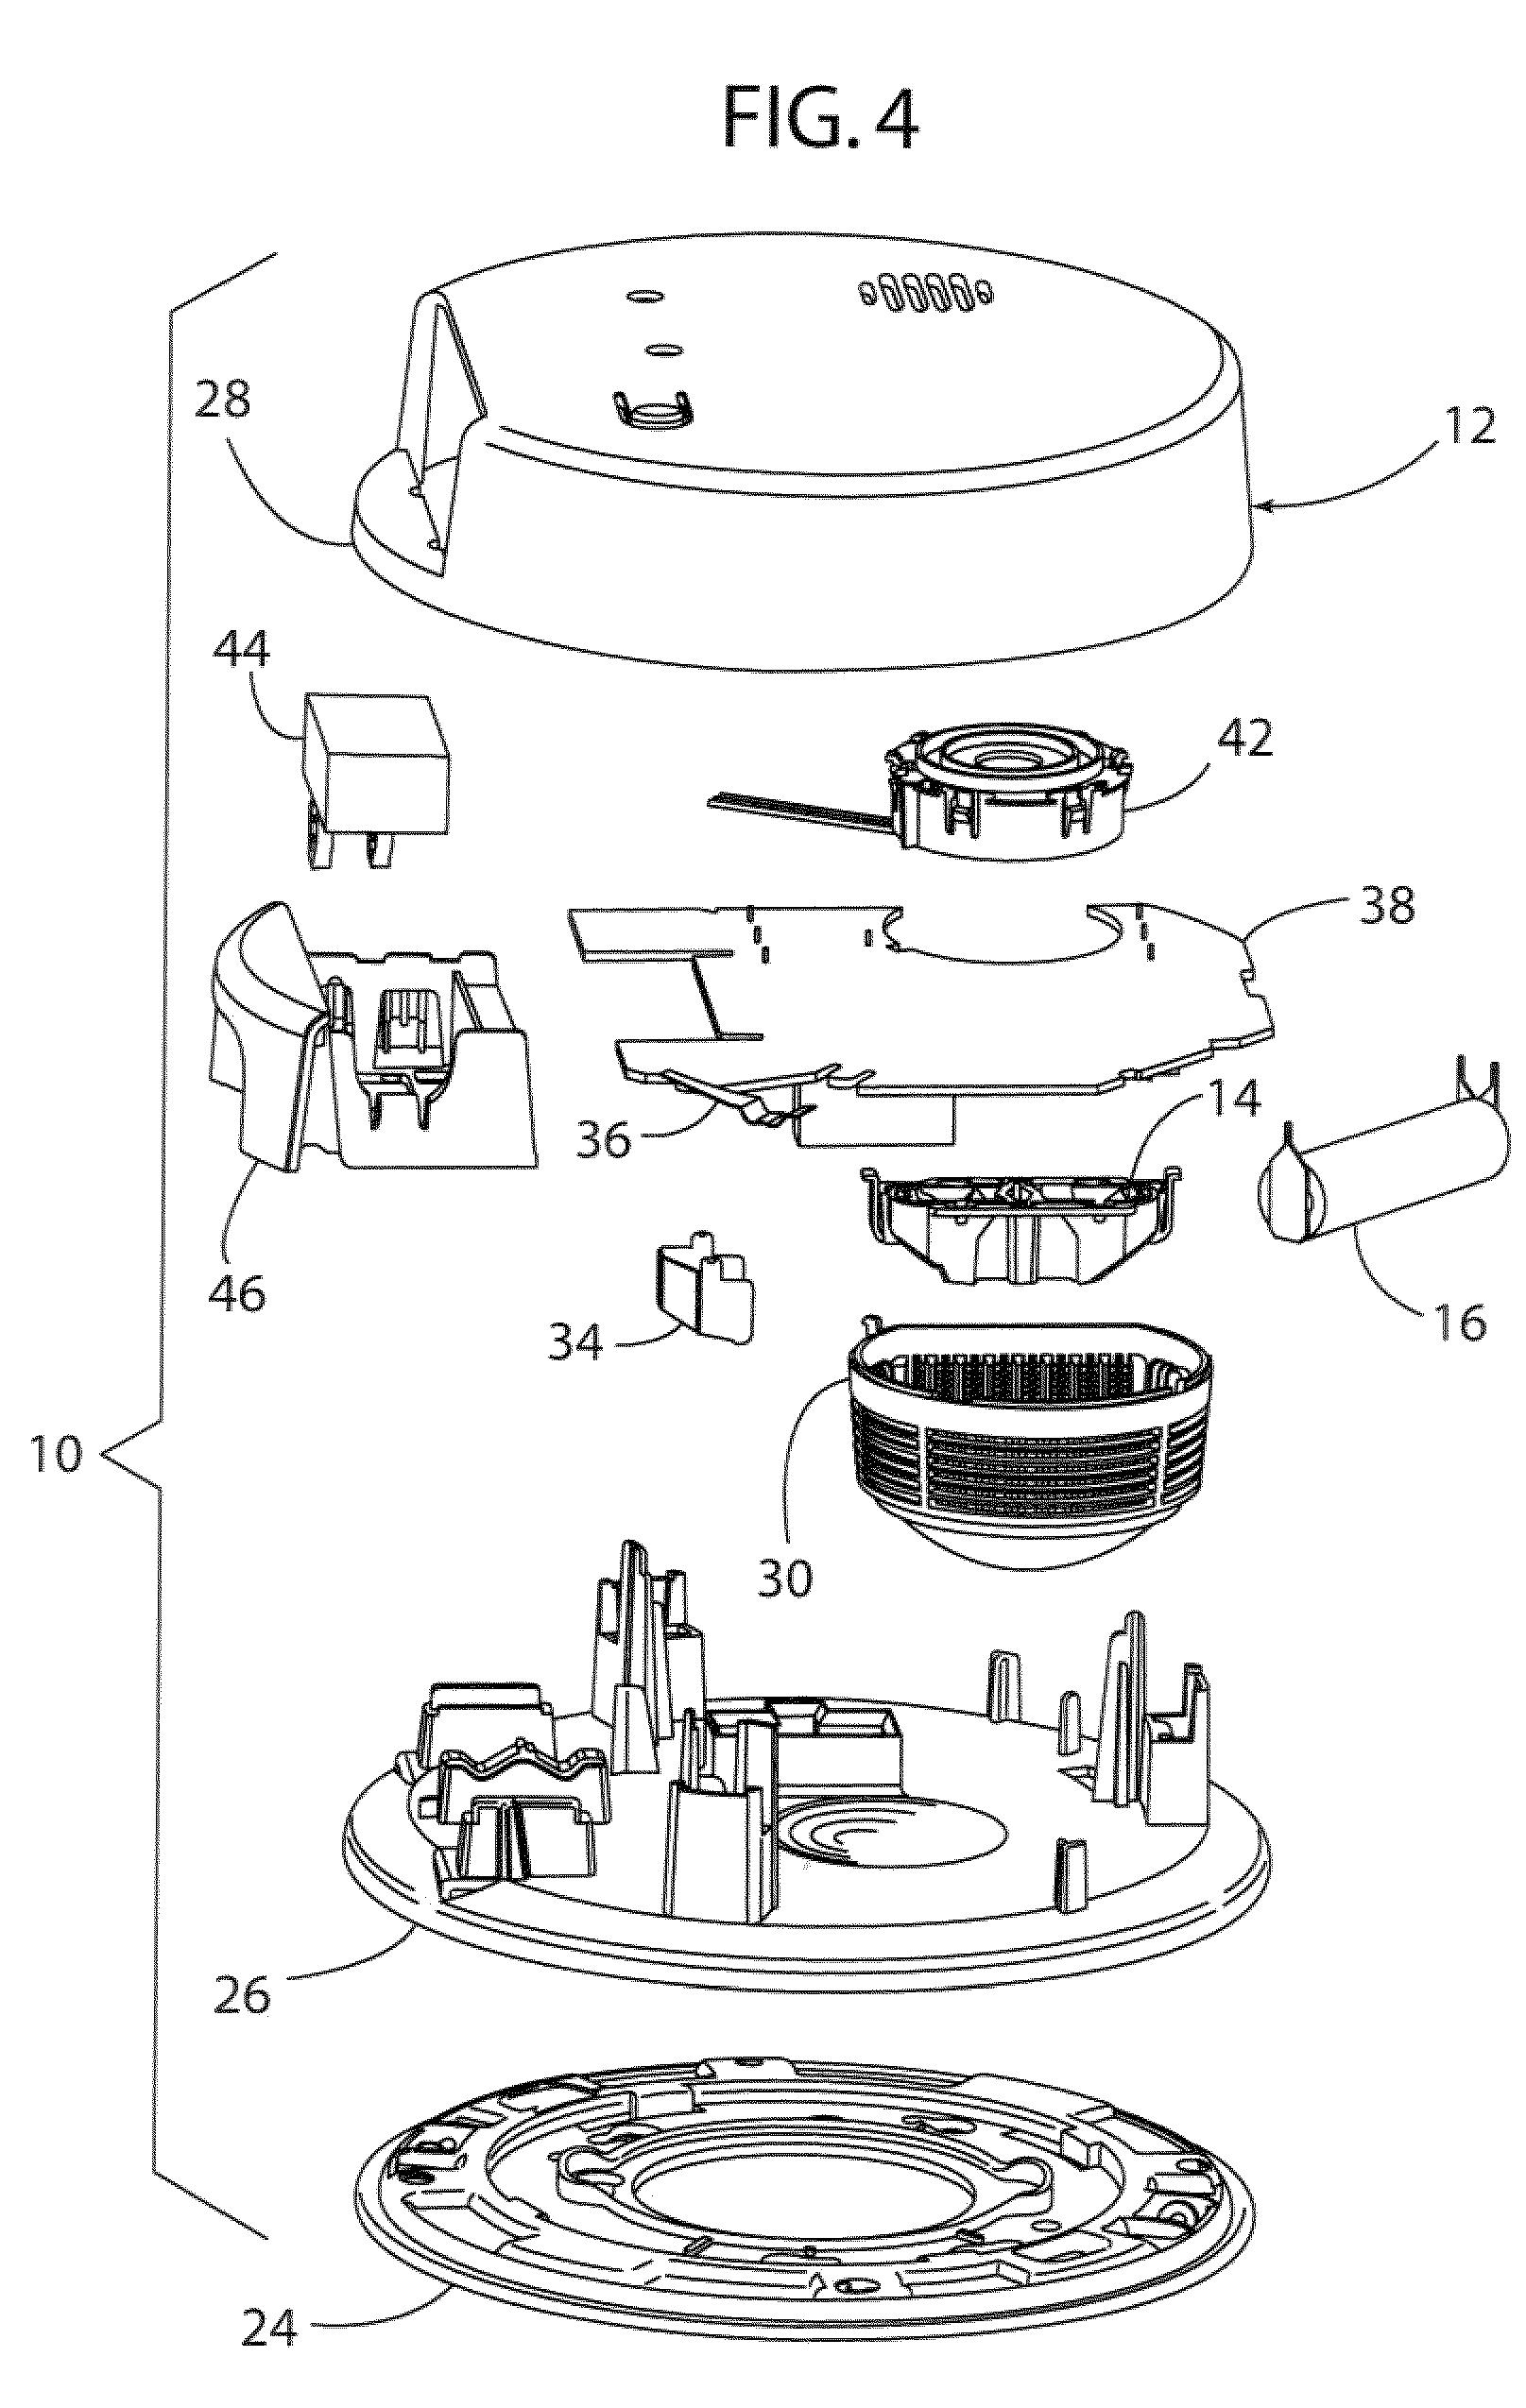 Smoke Detector Circuit Diagram Including Patent Us4792797 Alarm Us8232884 Carbon Monoxide And Detectors Having